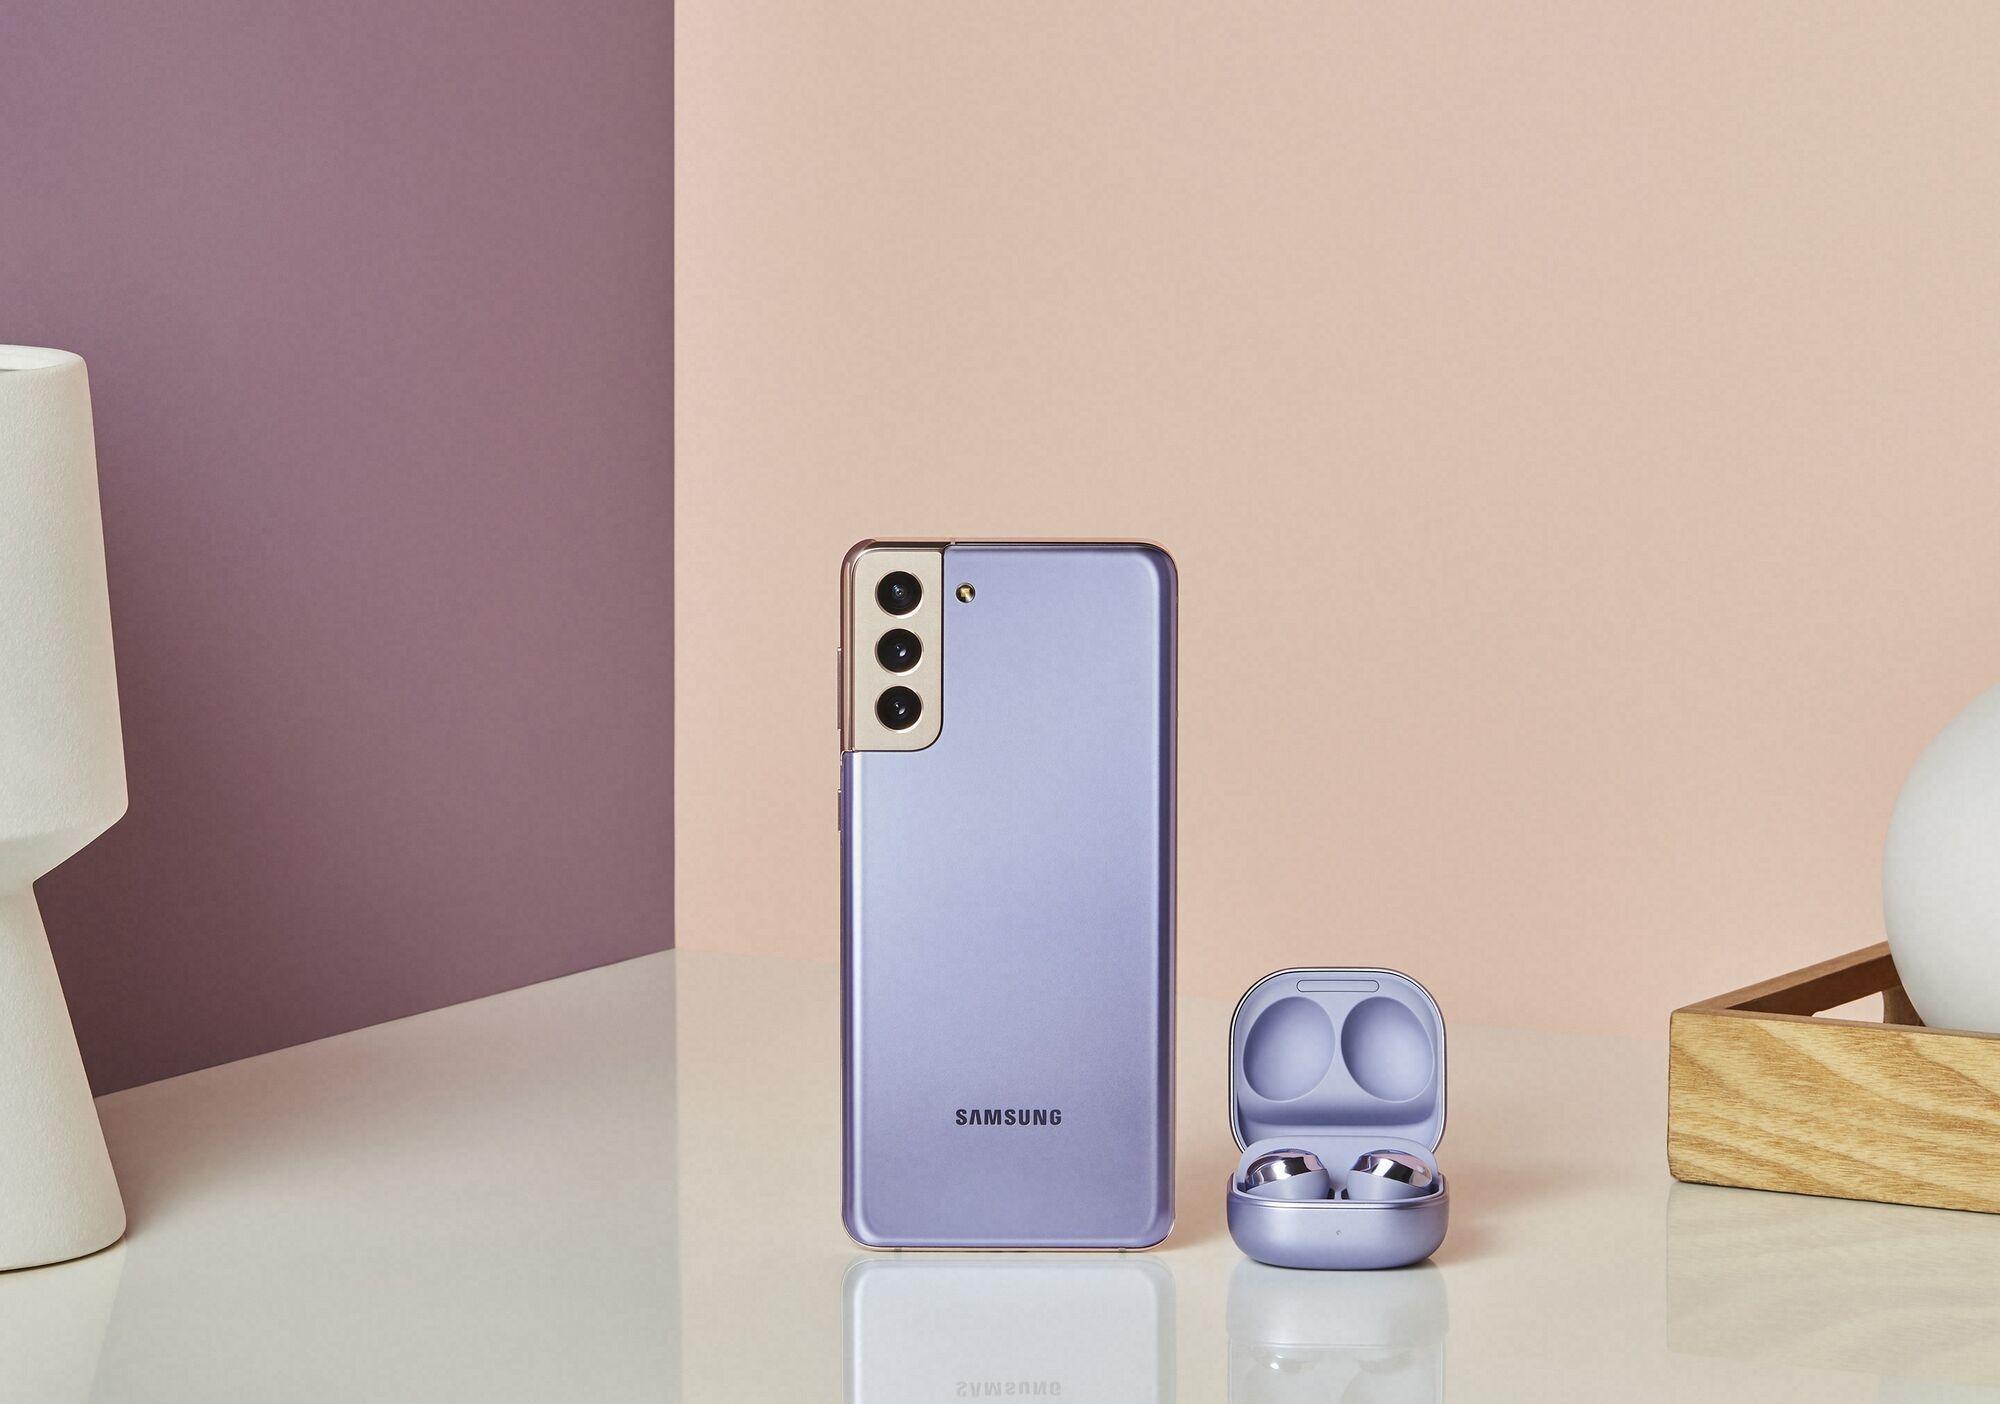 Samsung починає продажі Galaxy S21 Ultra, Galaxy S21 і Galaxy S21+